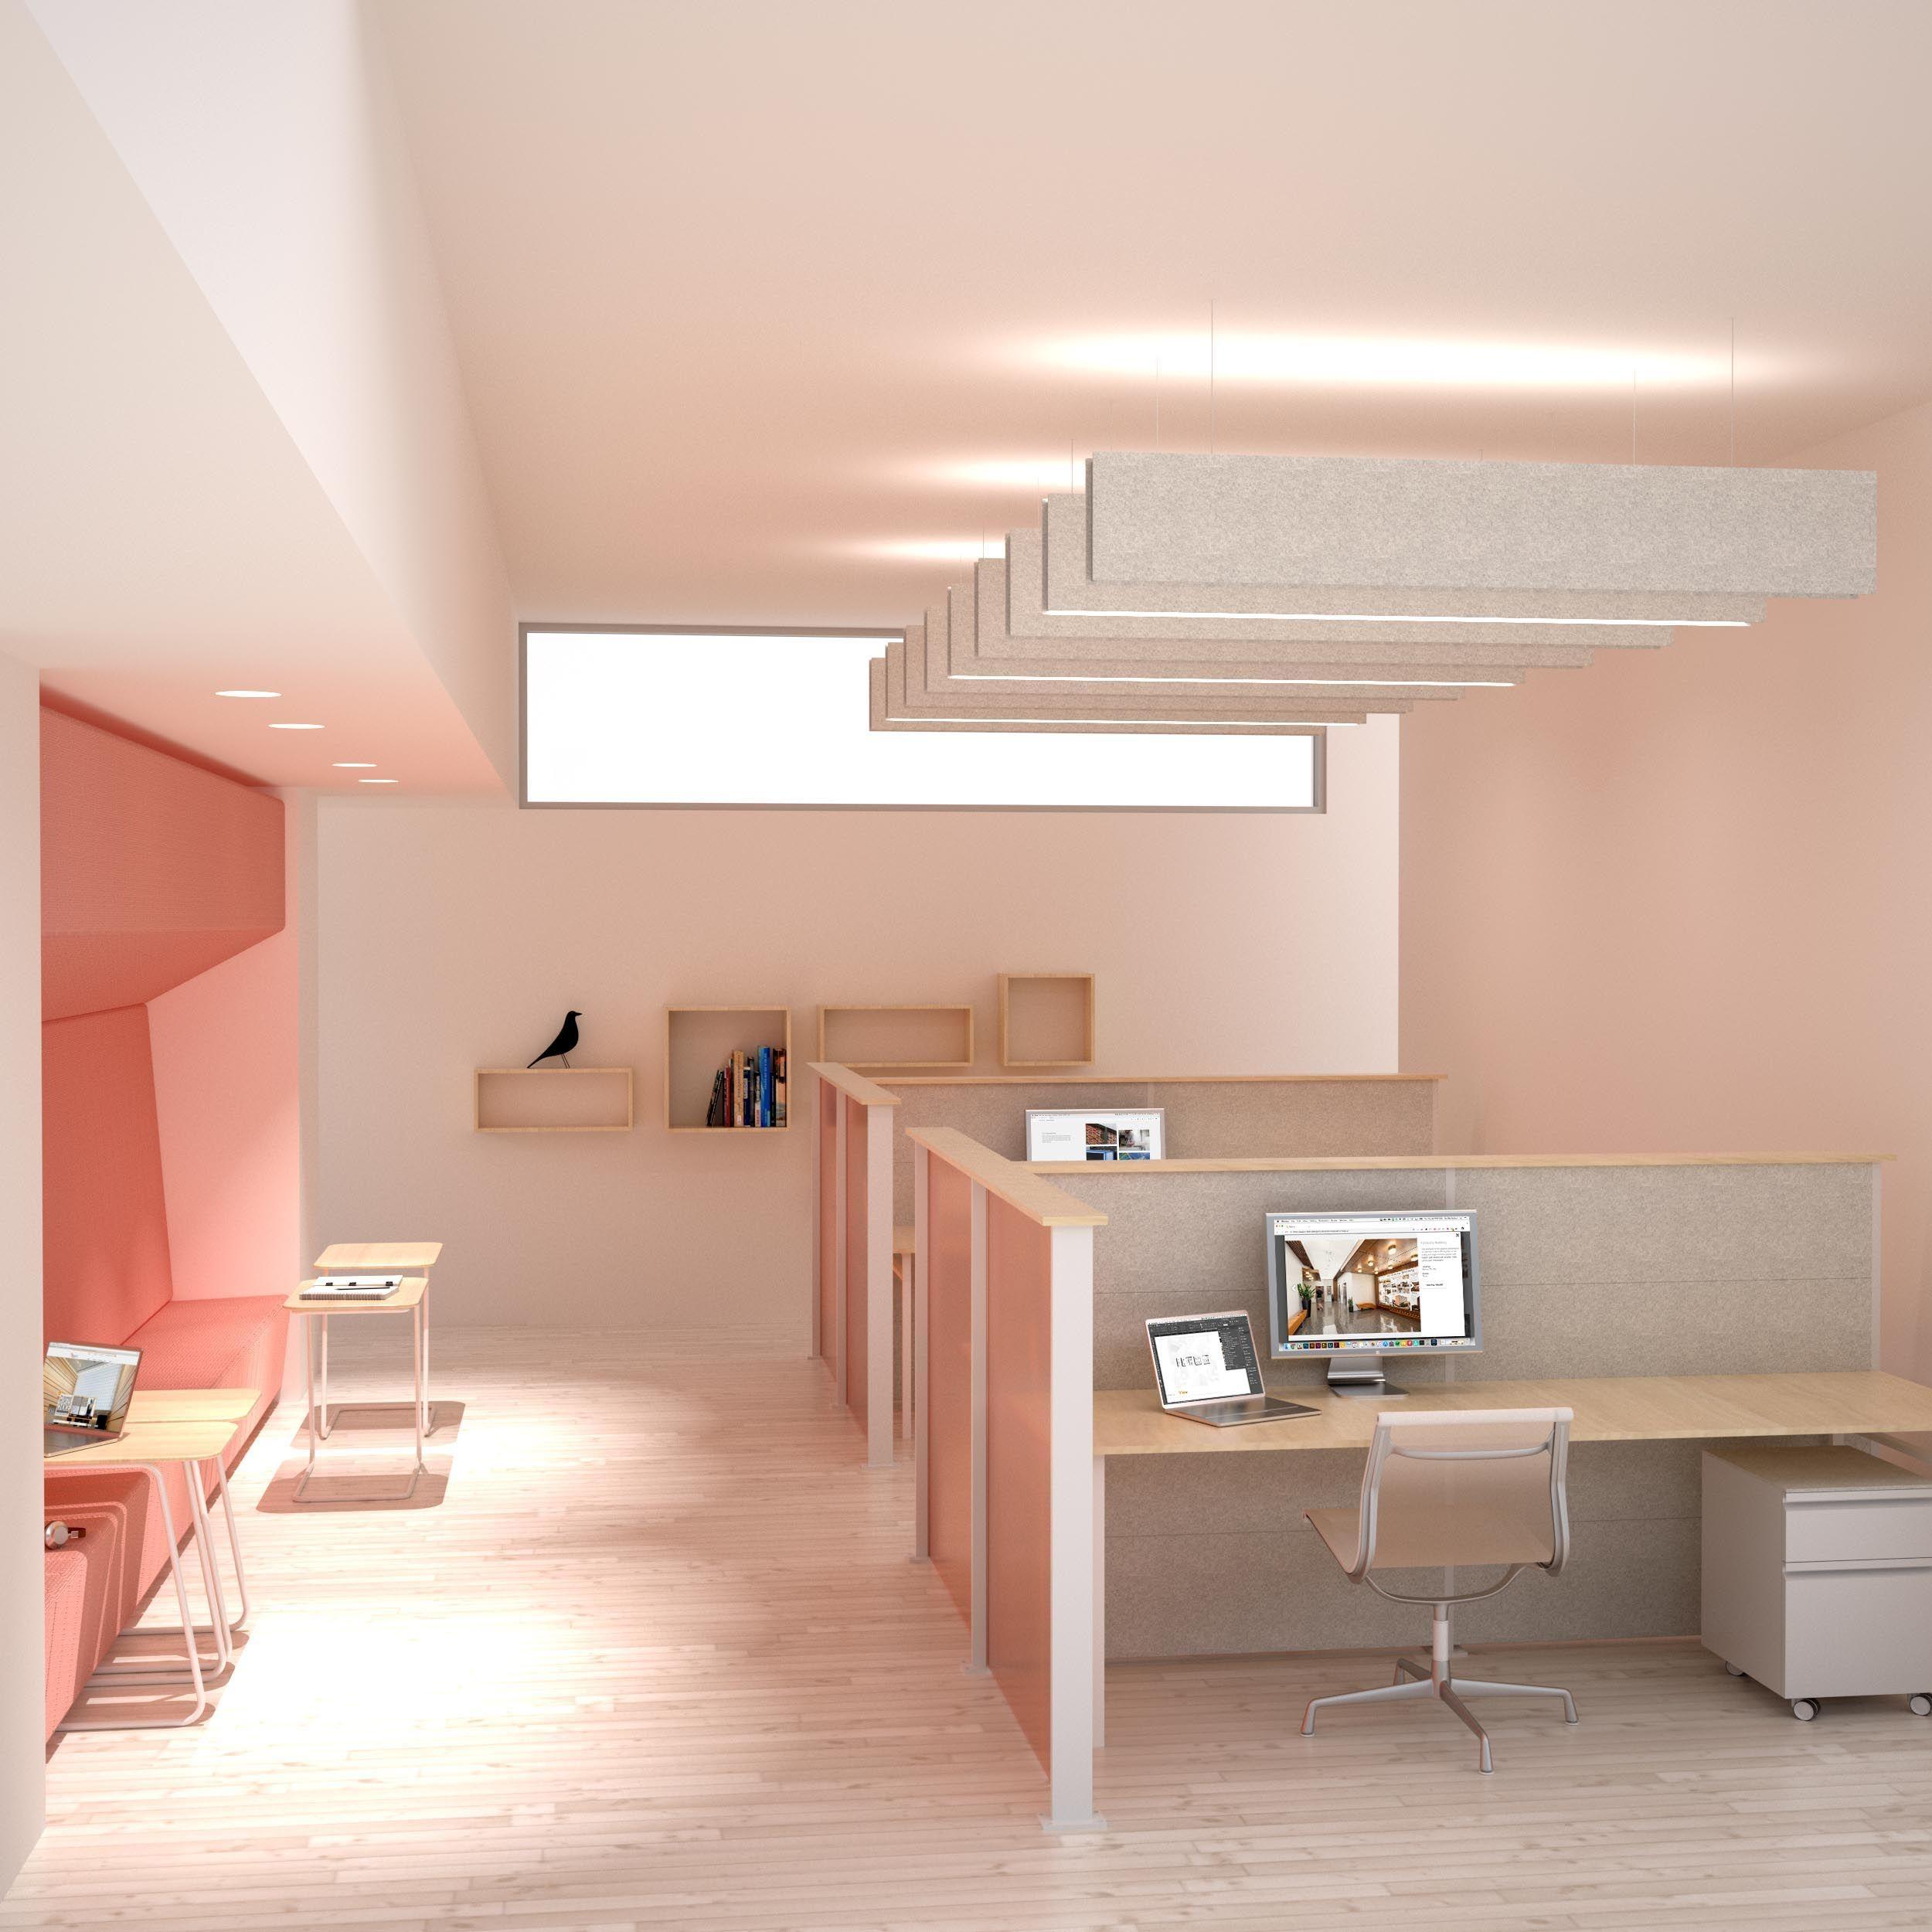 HOUSE in DZIALOSZYN on Behance in 2019   Interior design ...